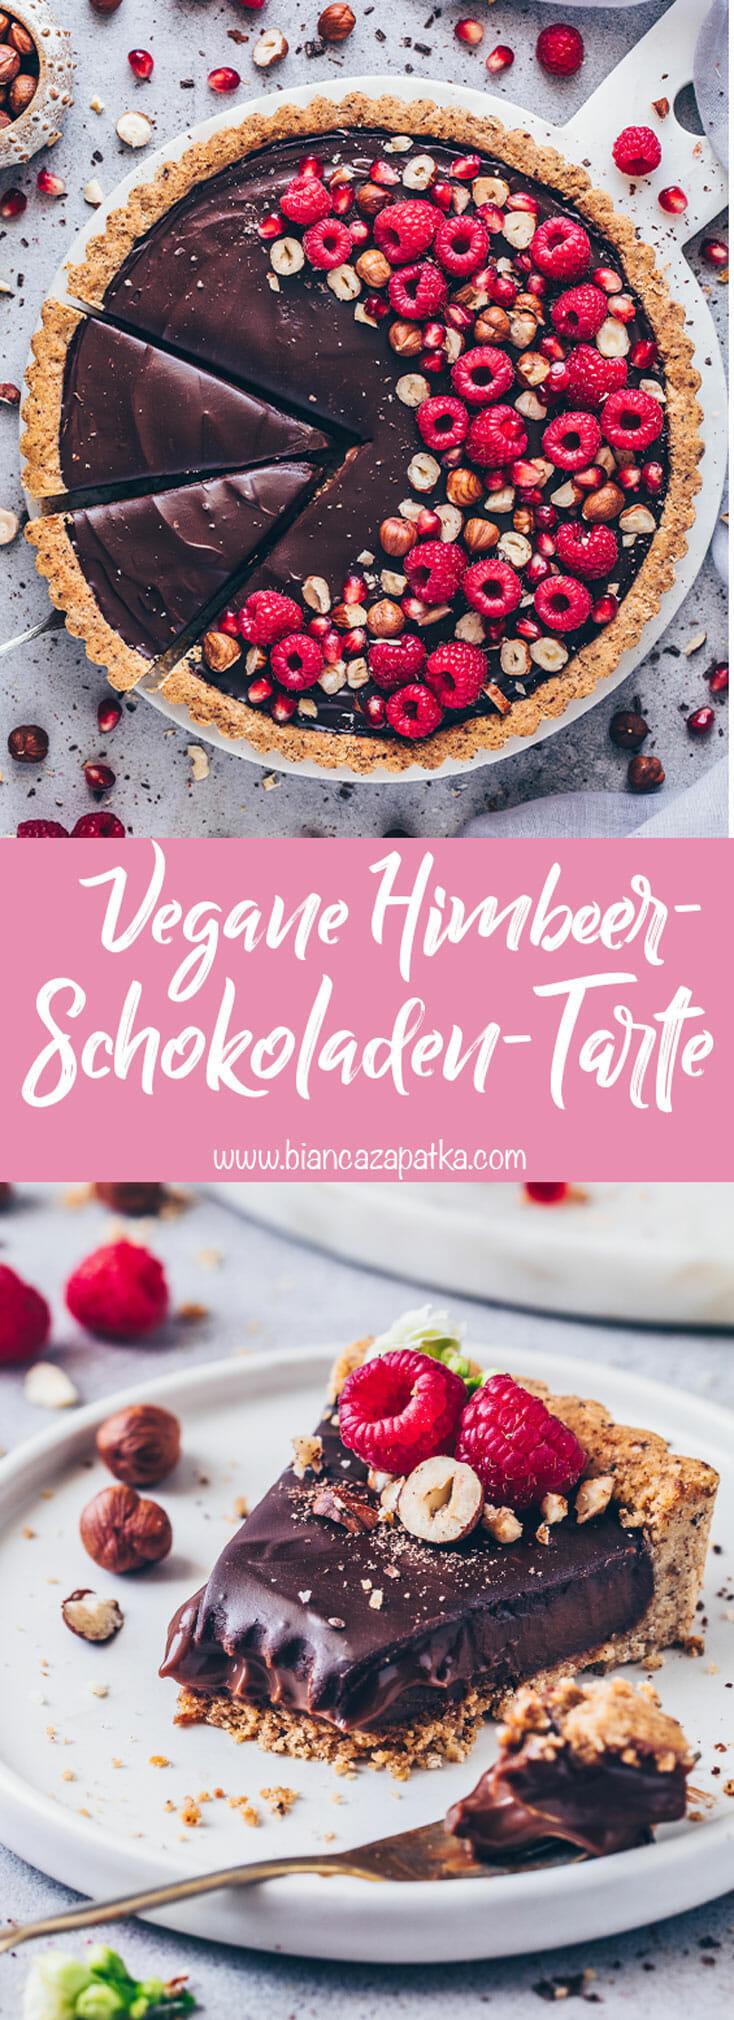 Himbeer-Schokoladen-Tarte (Vegane Nutella Schoko-Haselnuss Torte)